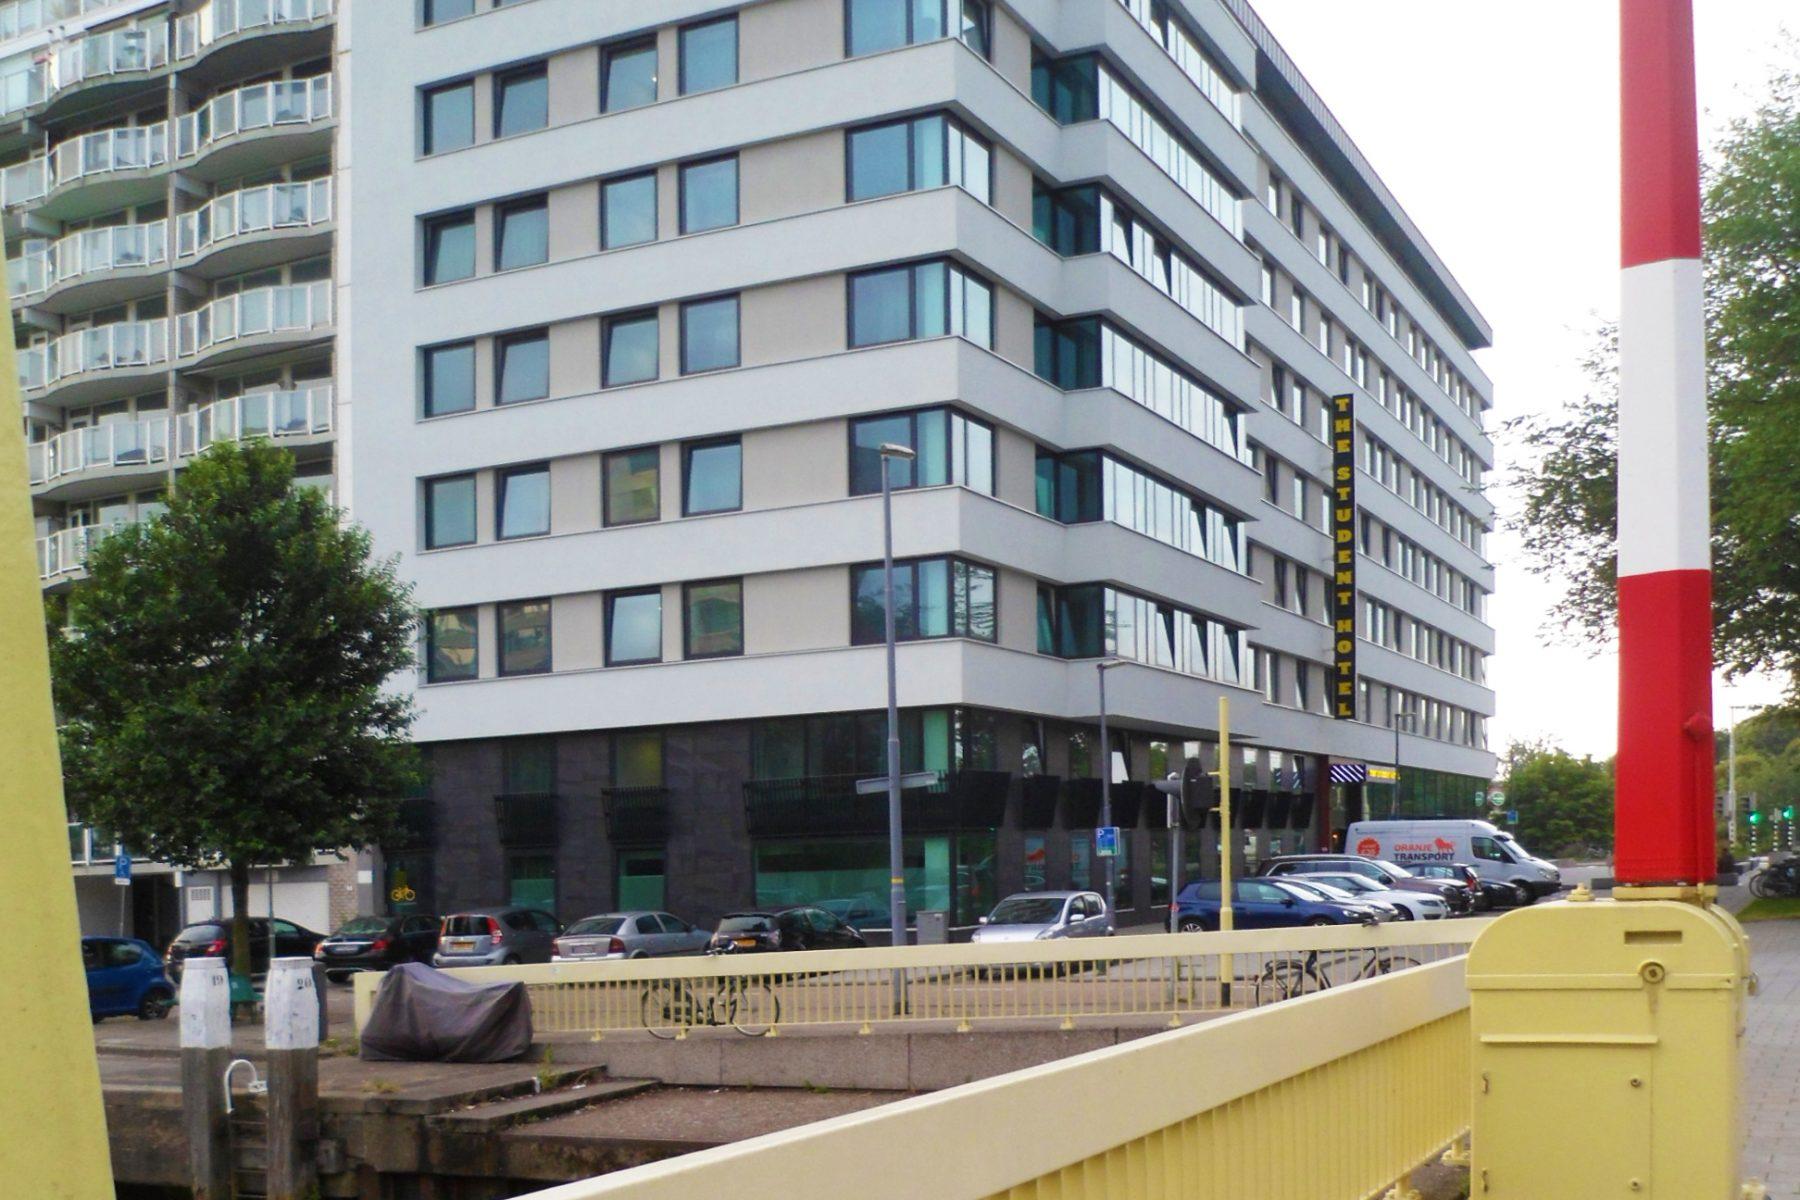 Rotterdam, Willem Ruyslaan, The Student Hotel